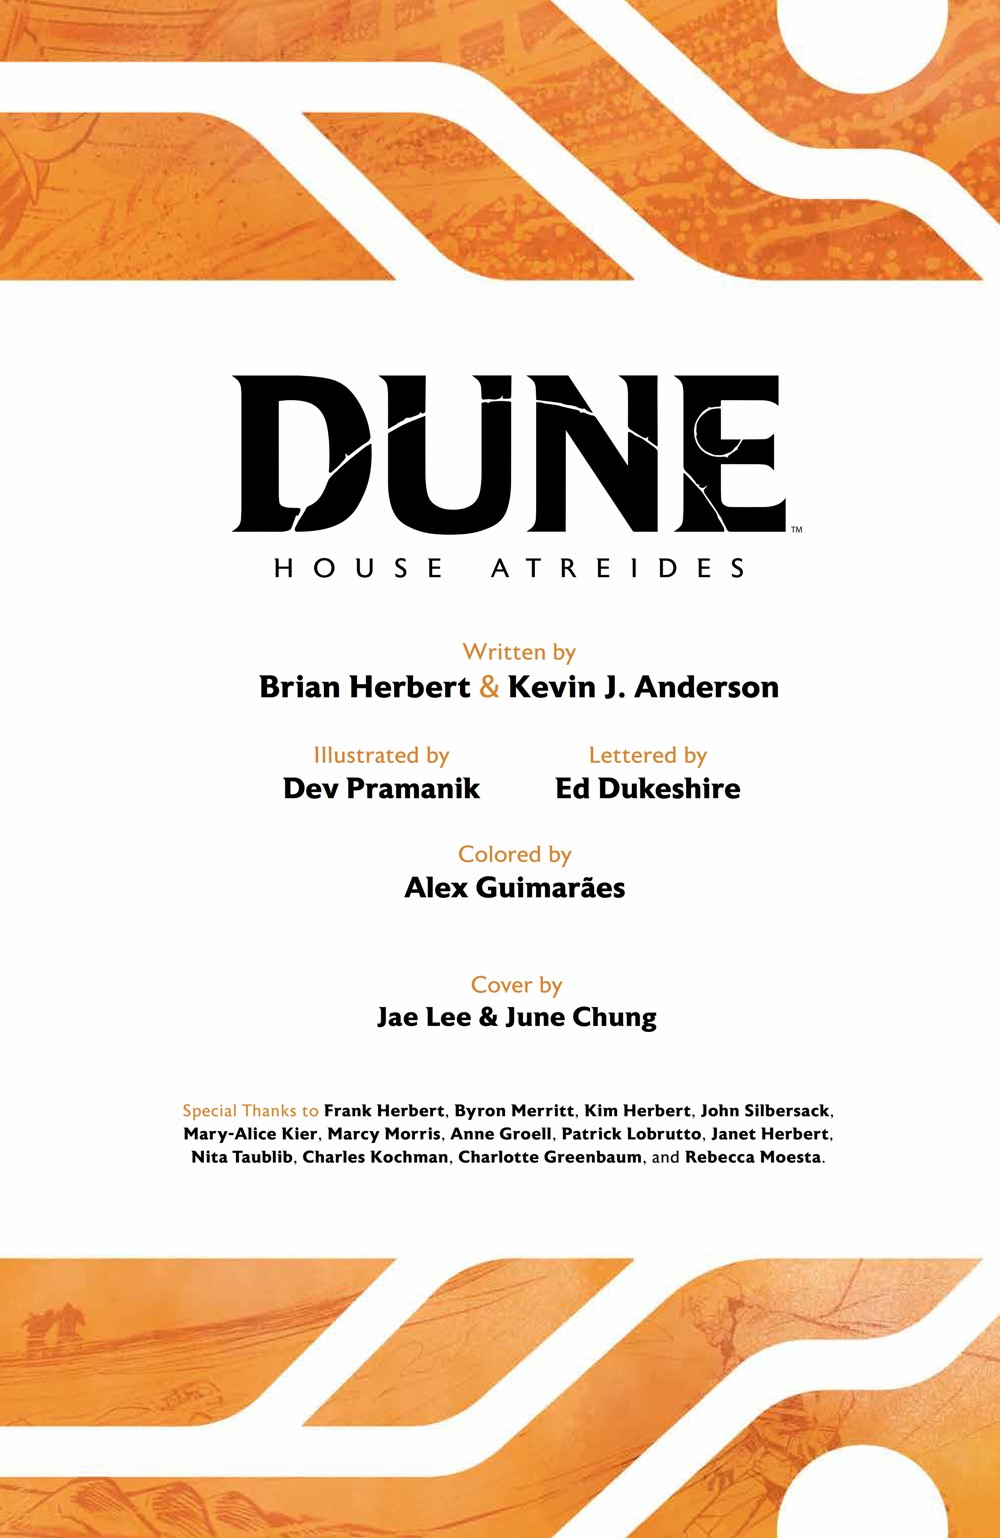 Dune_HouseAtreides_v1_HC_PRESS_5 ComicList Previews: DUNE HOUSE ATREIDES VOLUME 1 HC